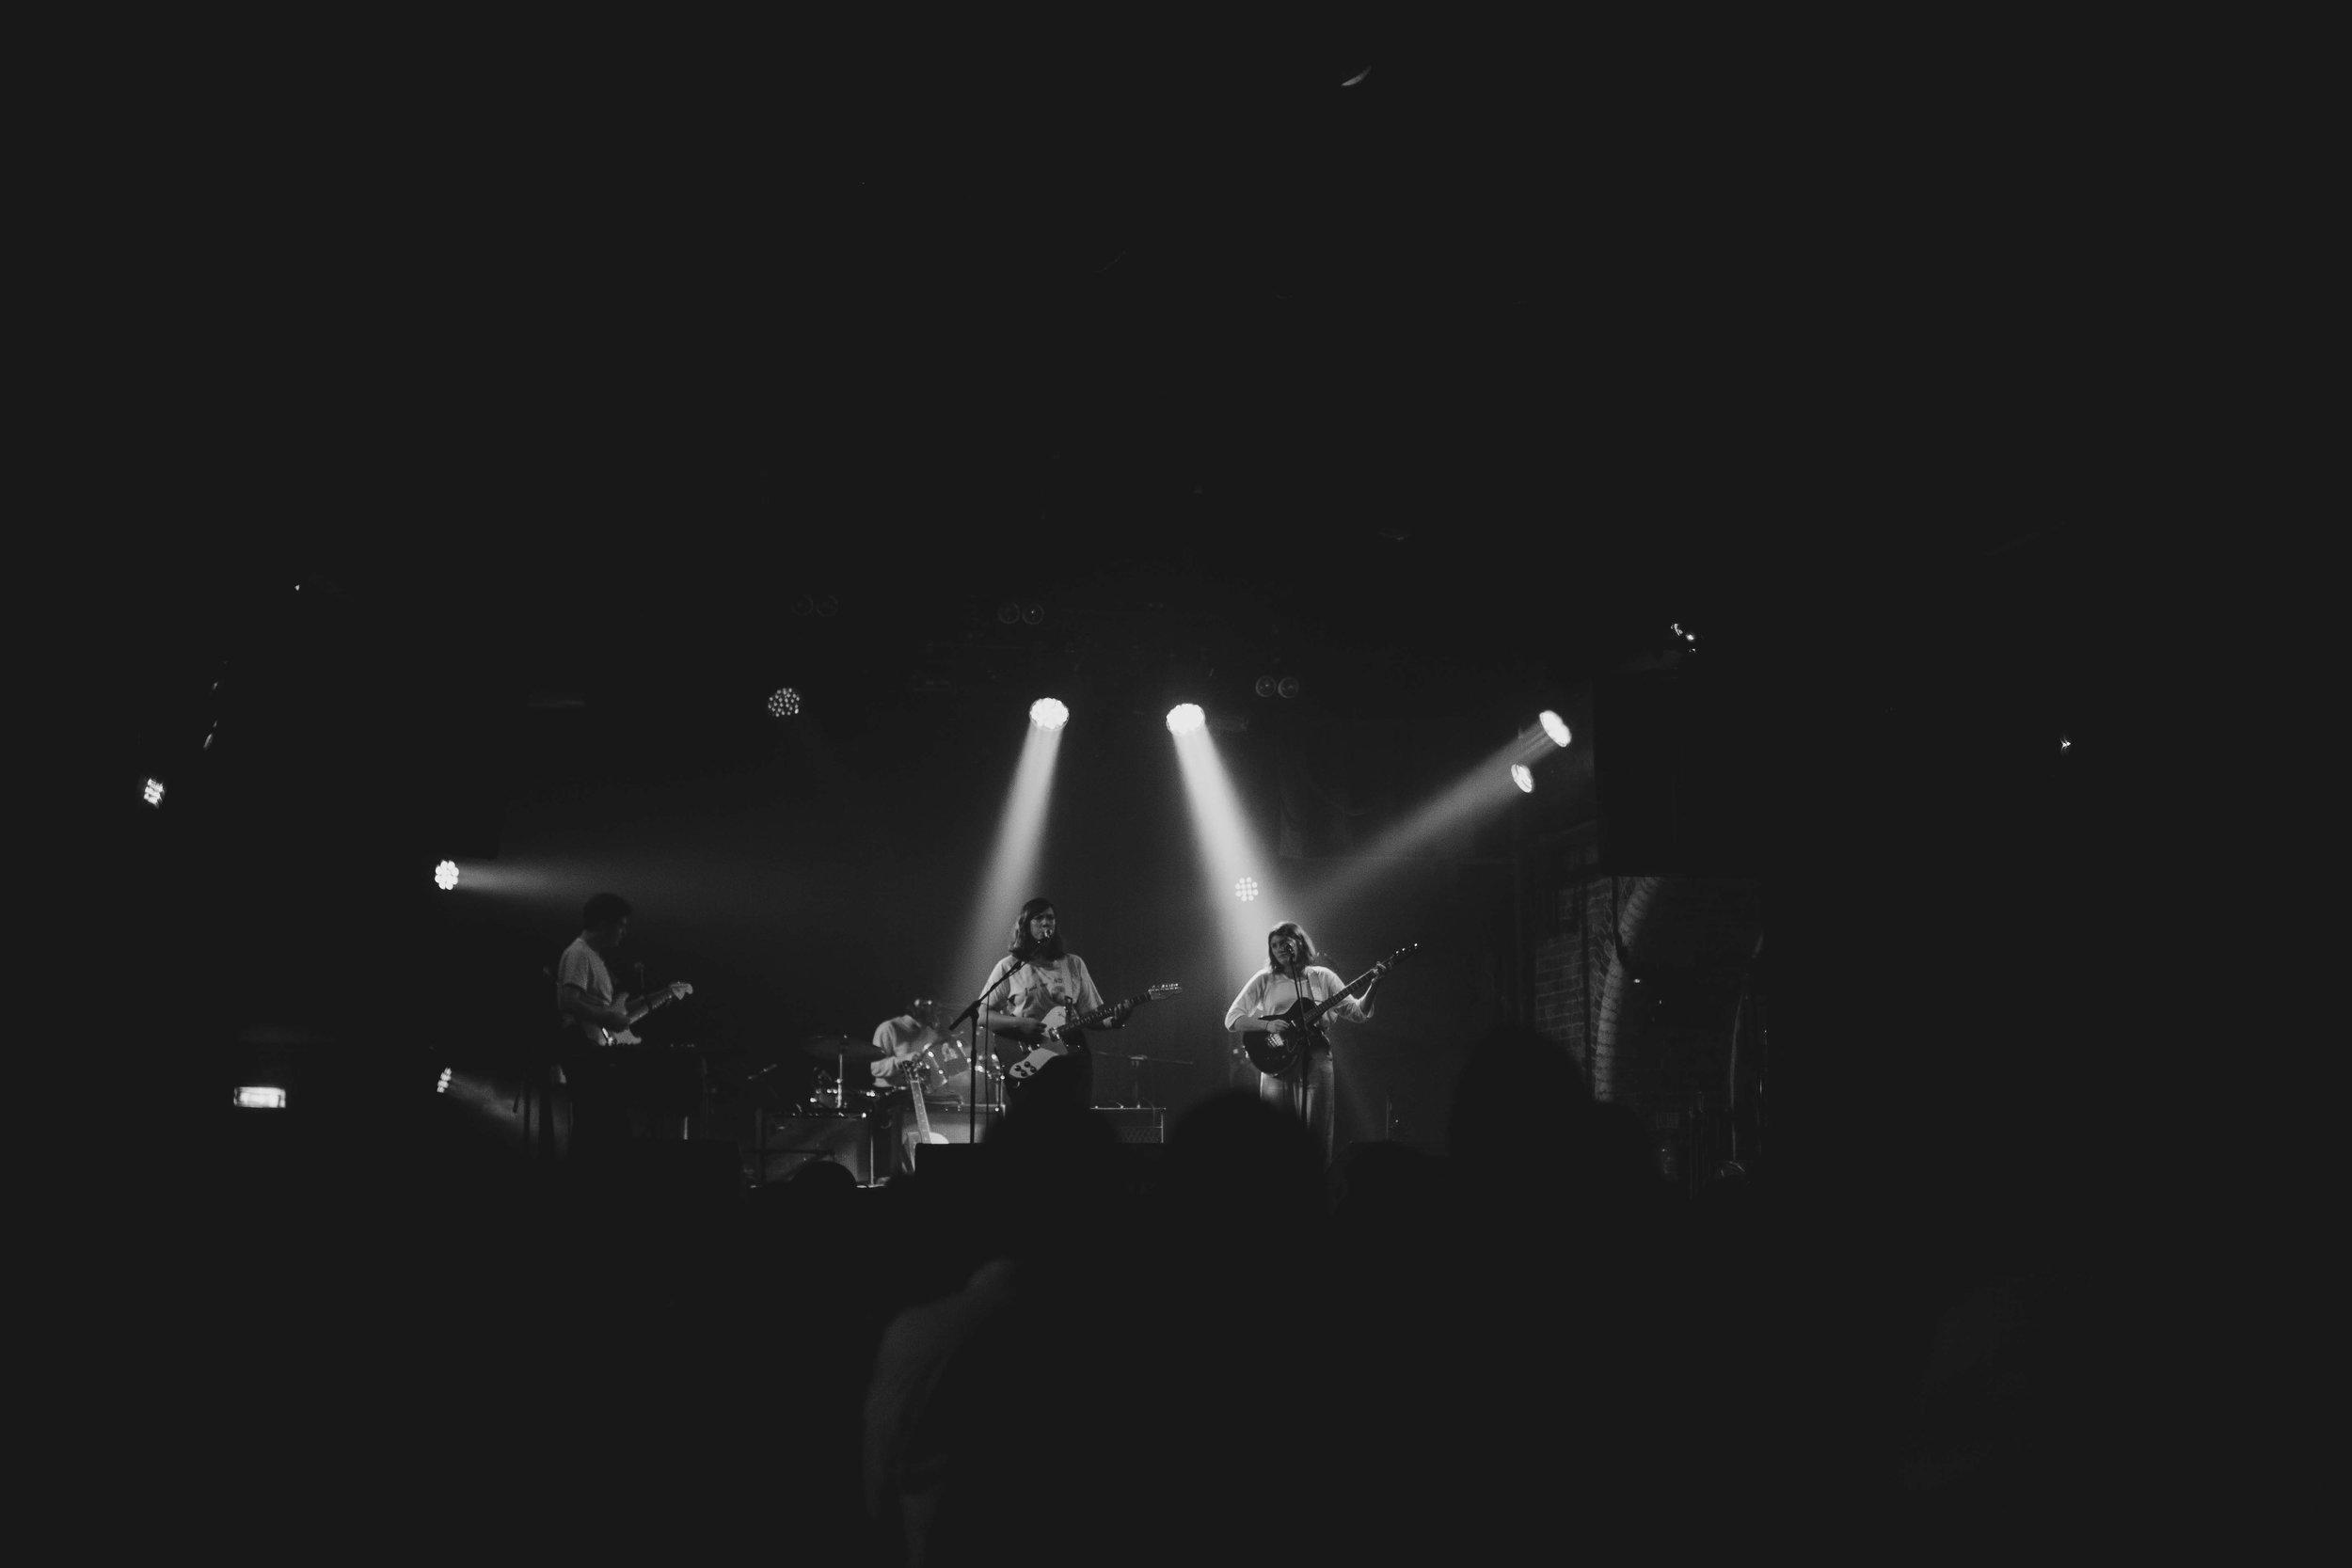 Girl-Ray-Heaven-Nightclub-008.jpg